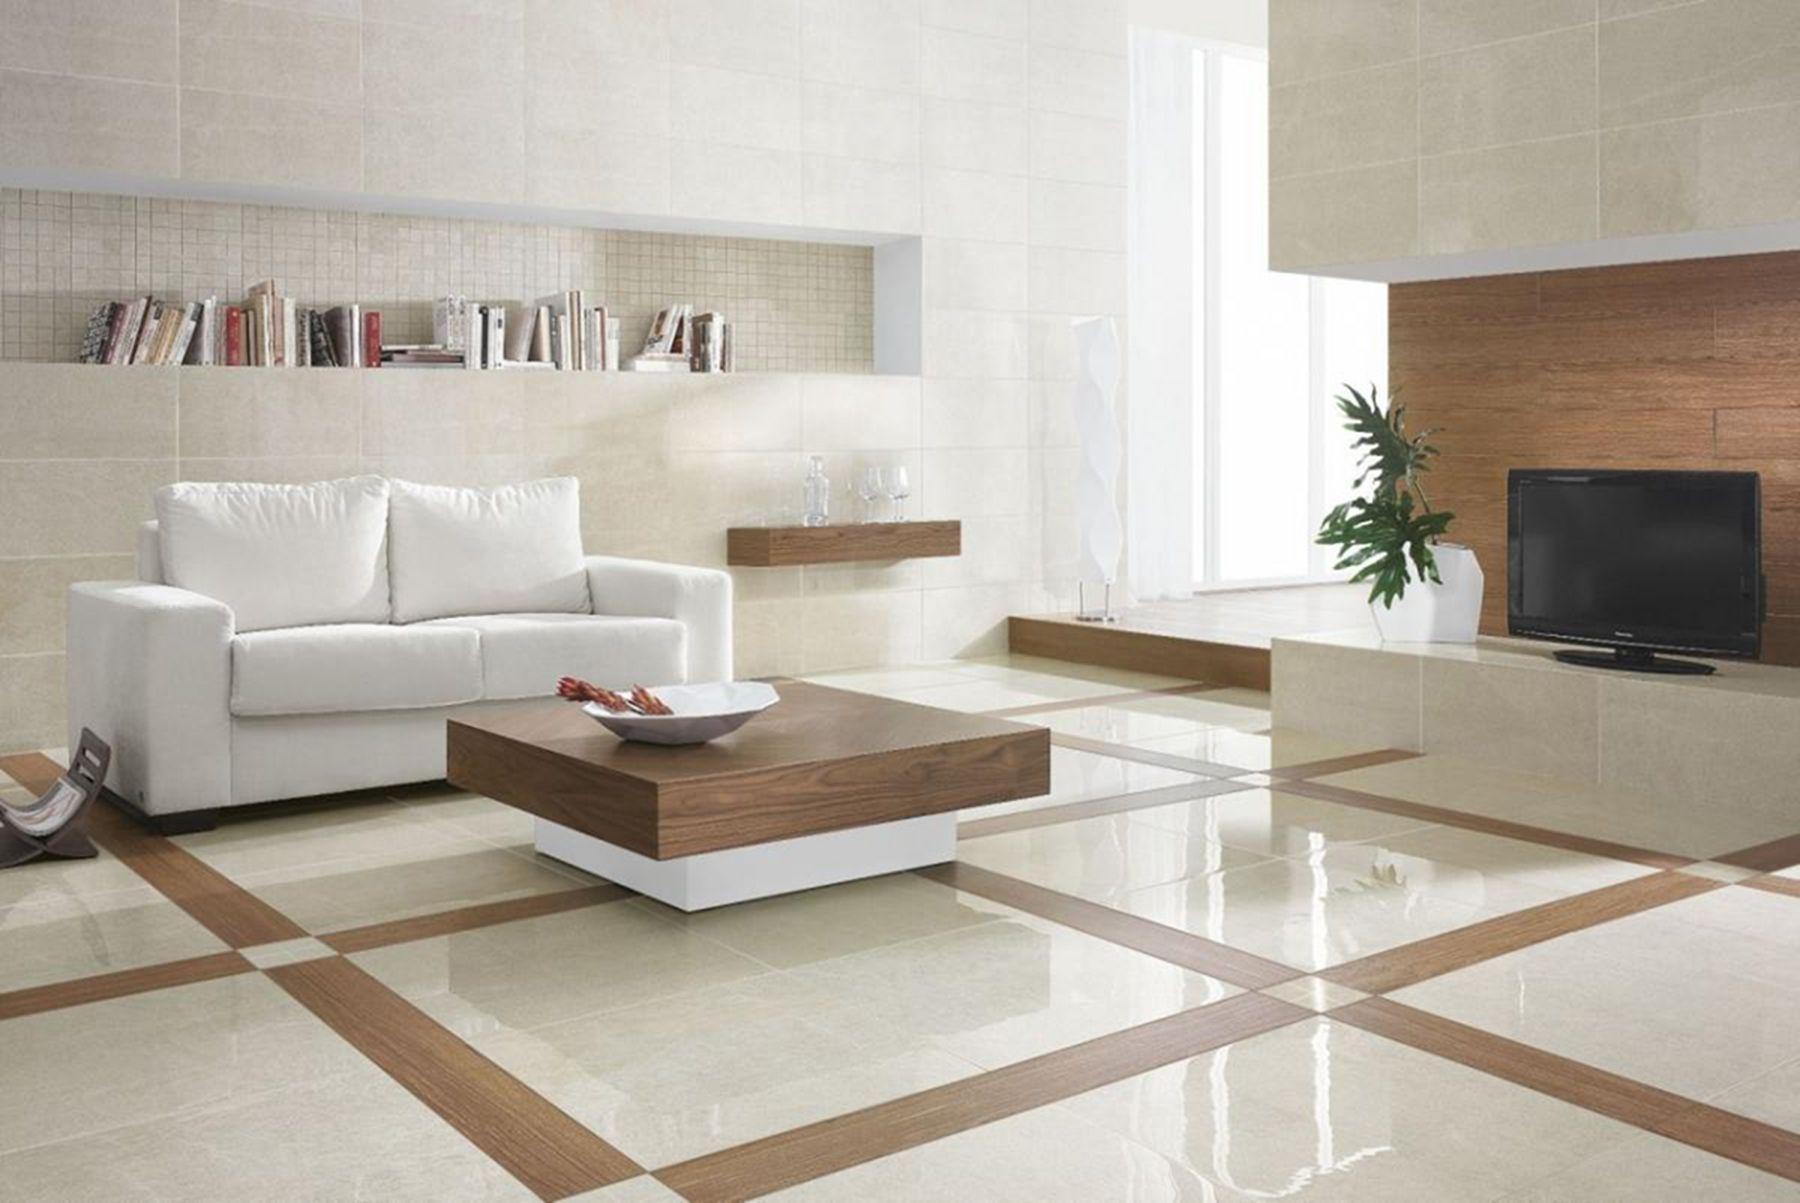 Interesting Home Floor Design Ideas You Should Know Floordesign Floorideas Homefloormotif Living Room Tiles Floor Tile Design Living Room Flooring